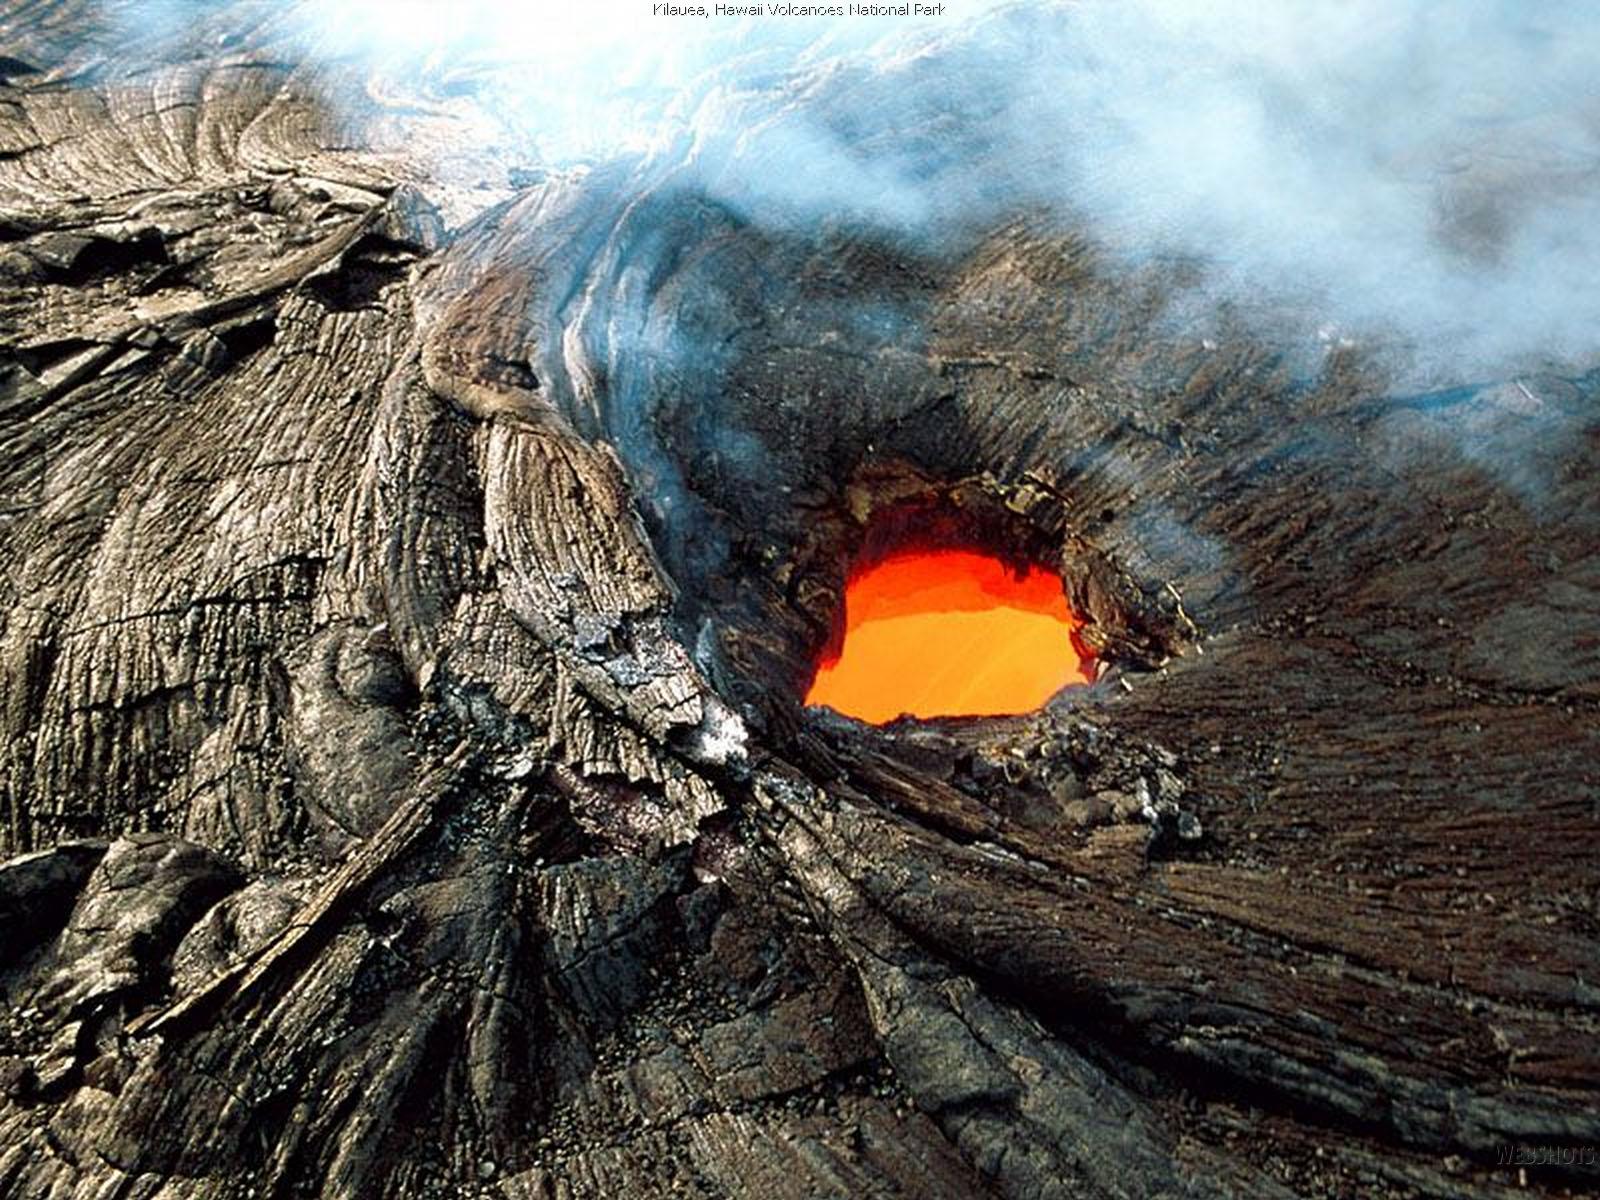 kilauea_hawaii_volcanoes_national_park_wallpaper-normal